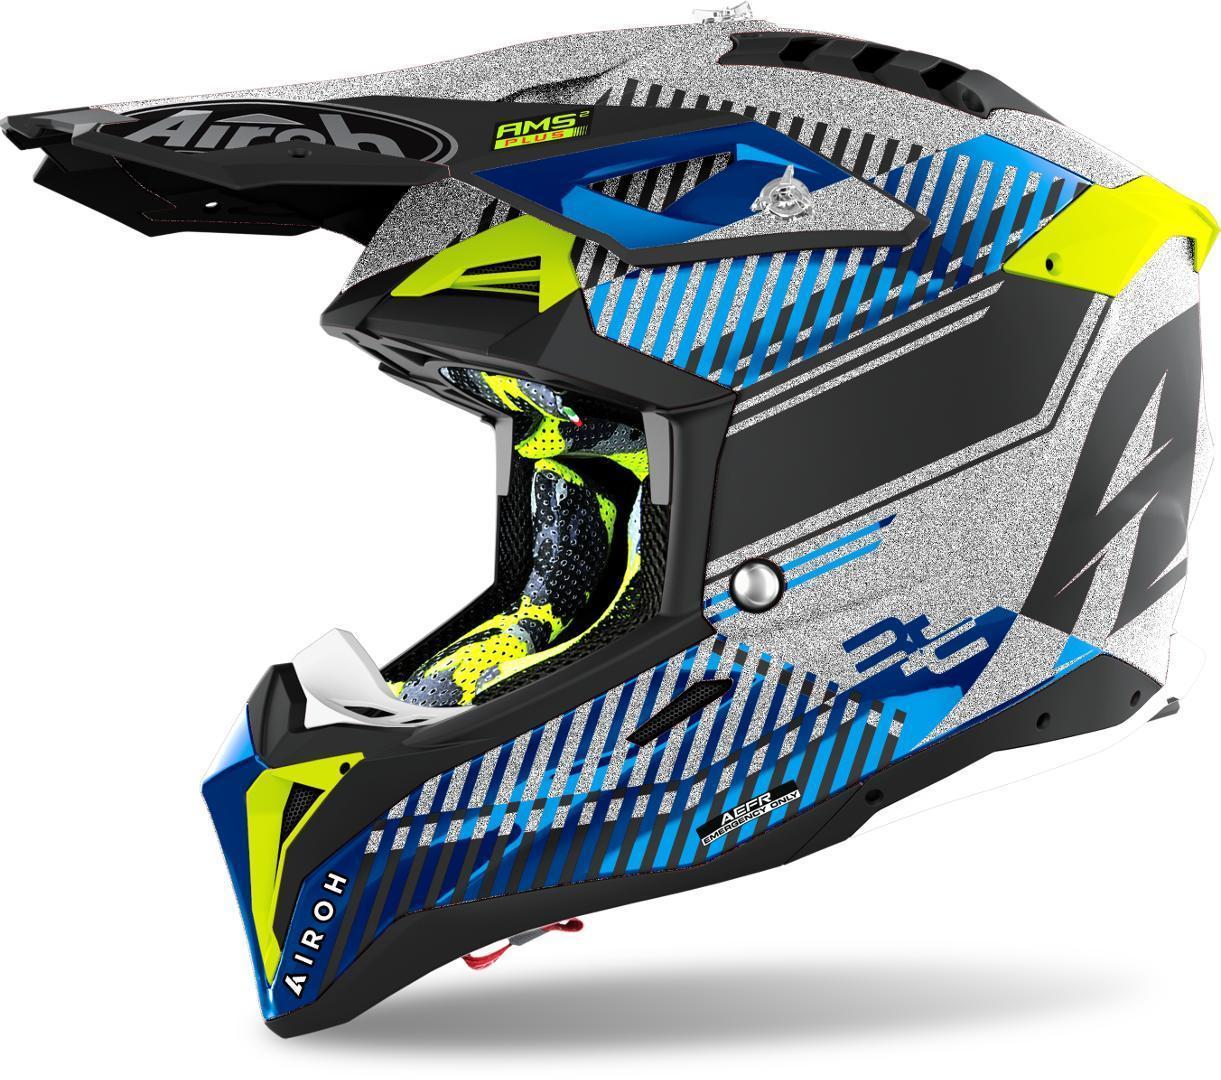 Airoh Aviator 3 Wave Carbon Motocross Helm, silber, Größe S, silber, Größe S